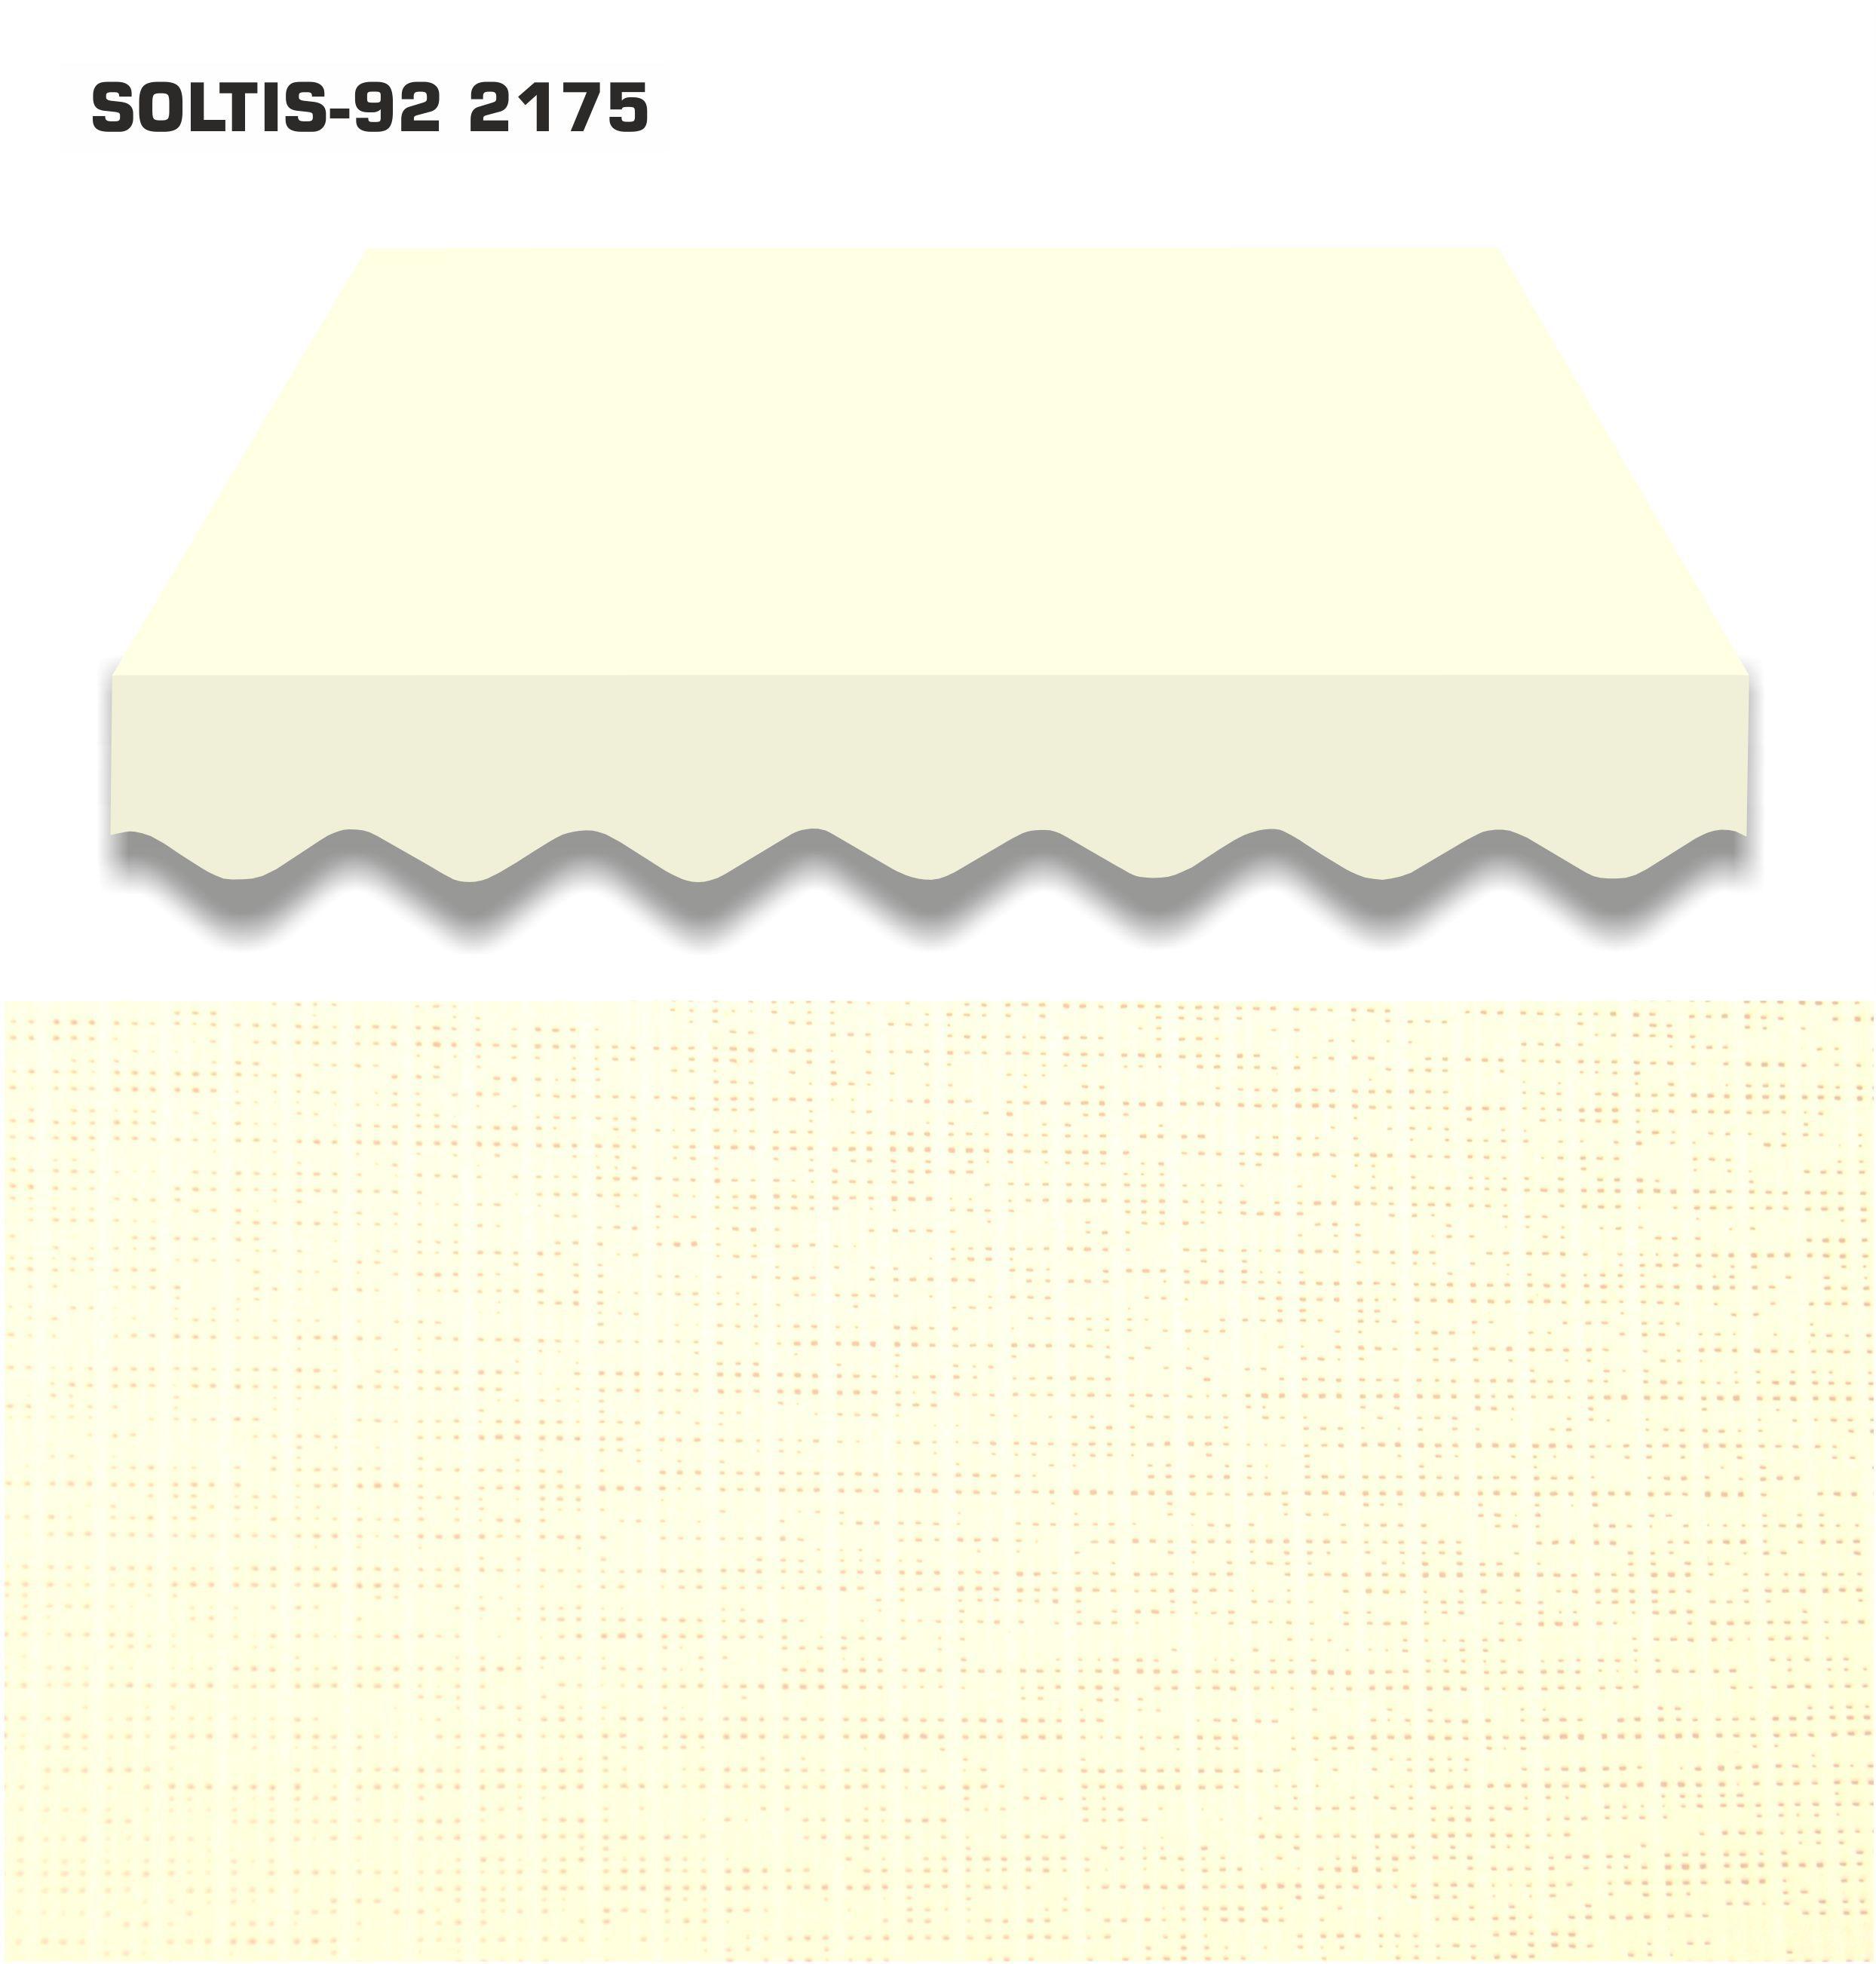 Soltis-92 2175